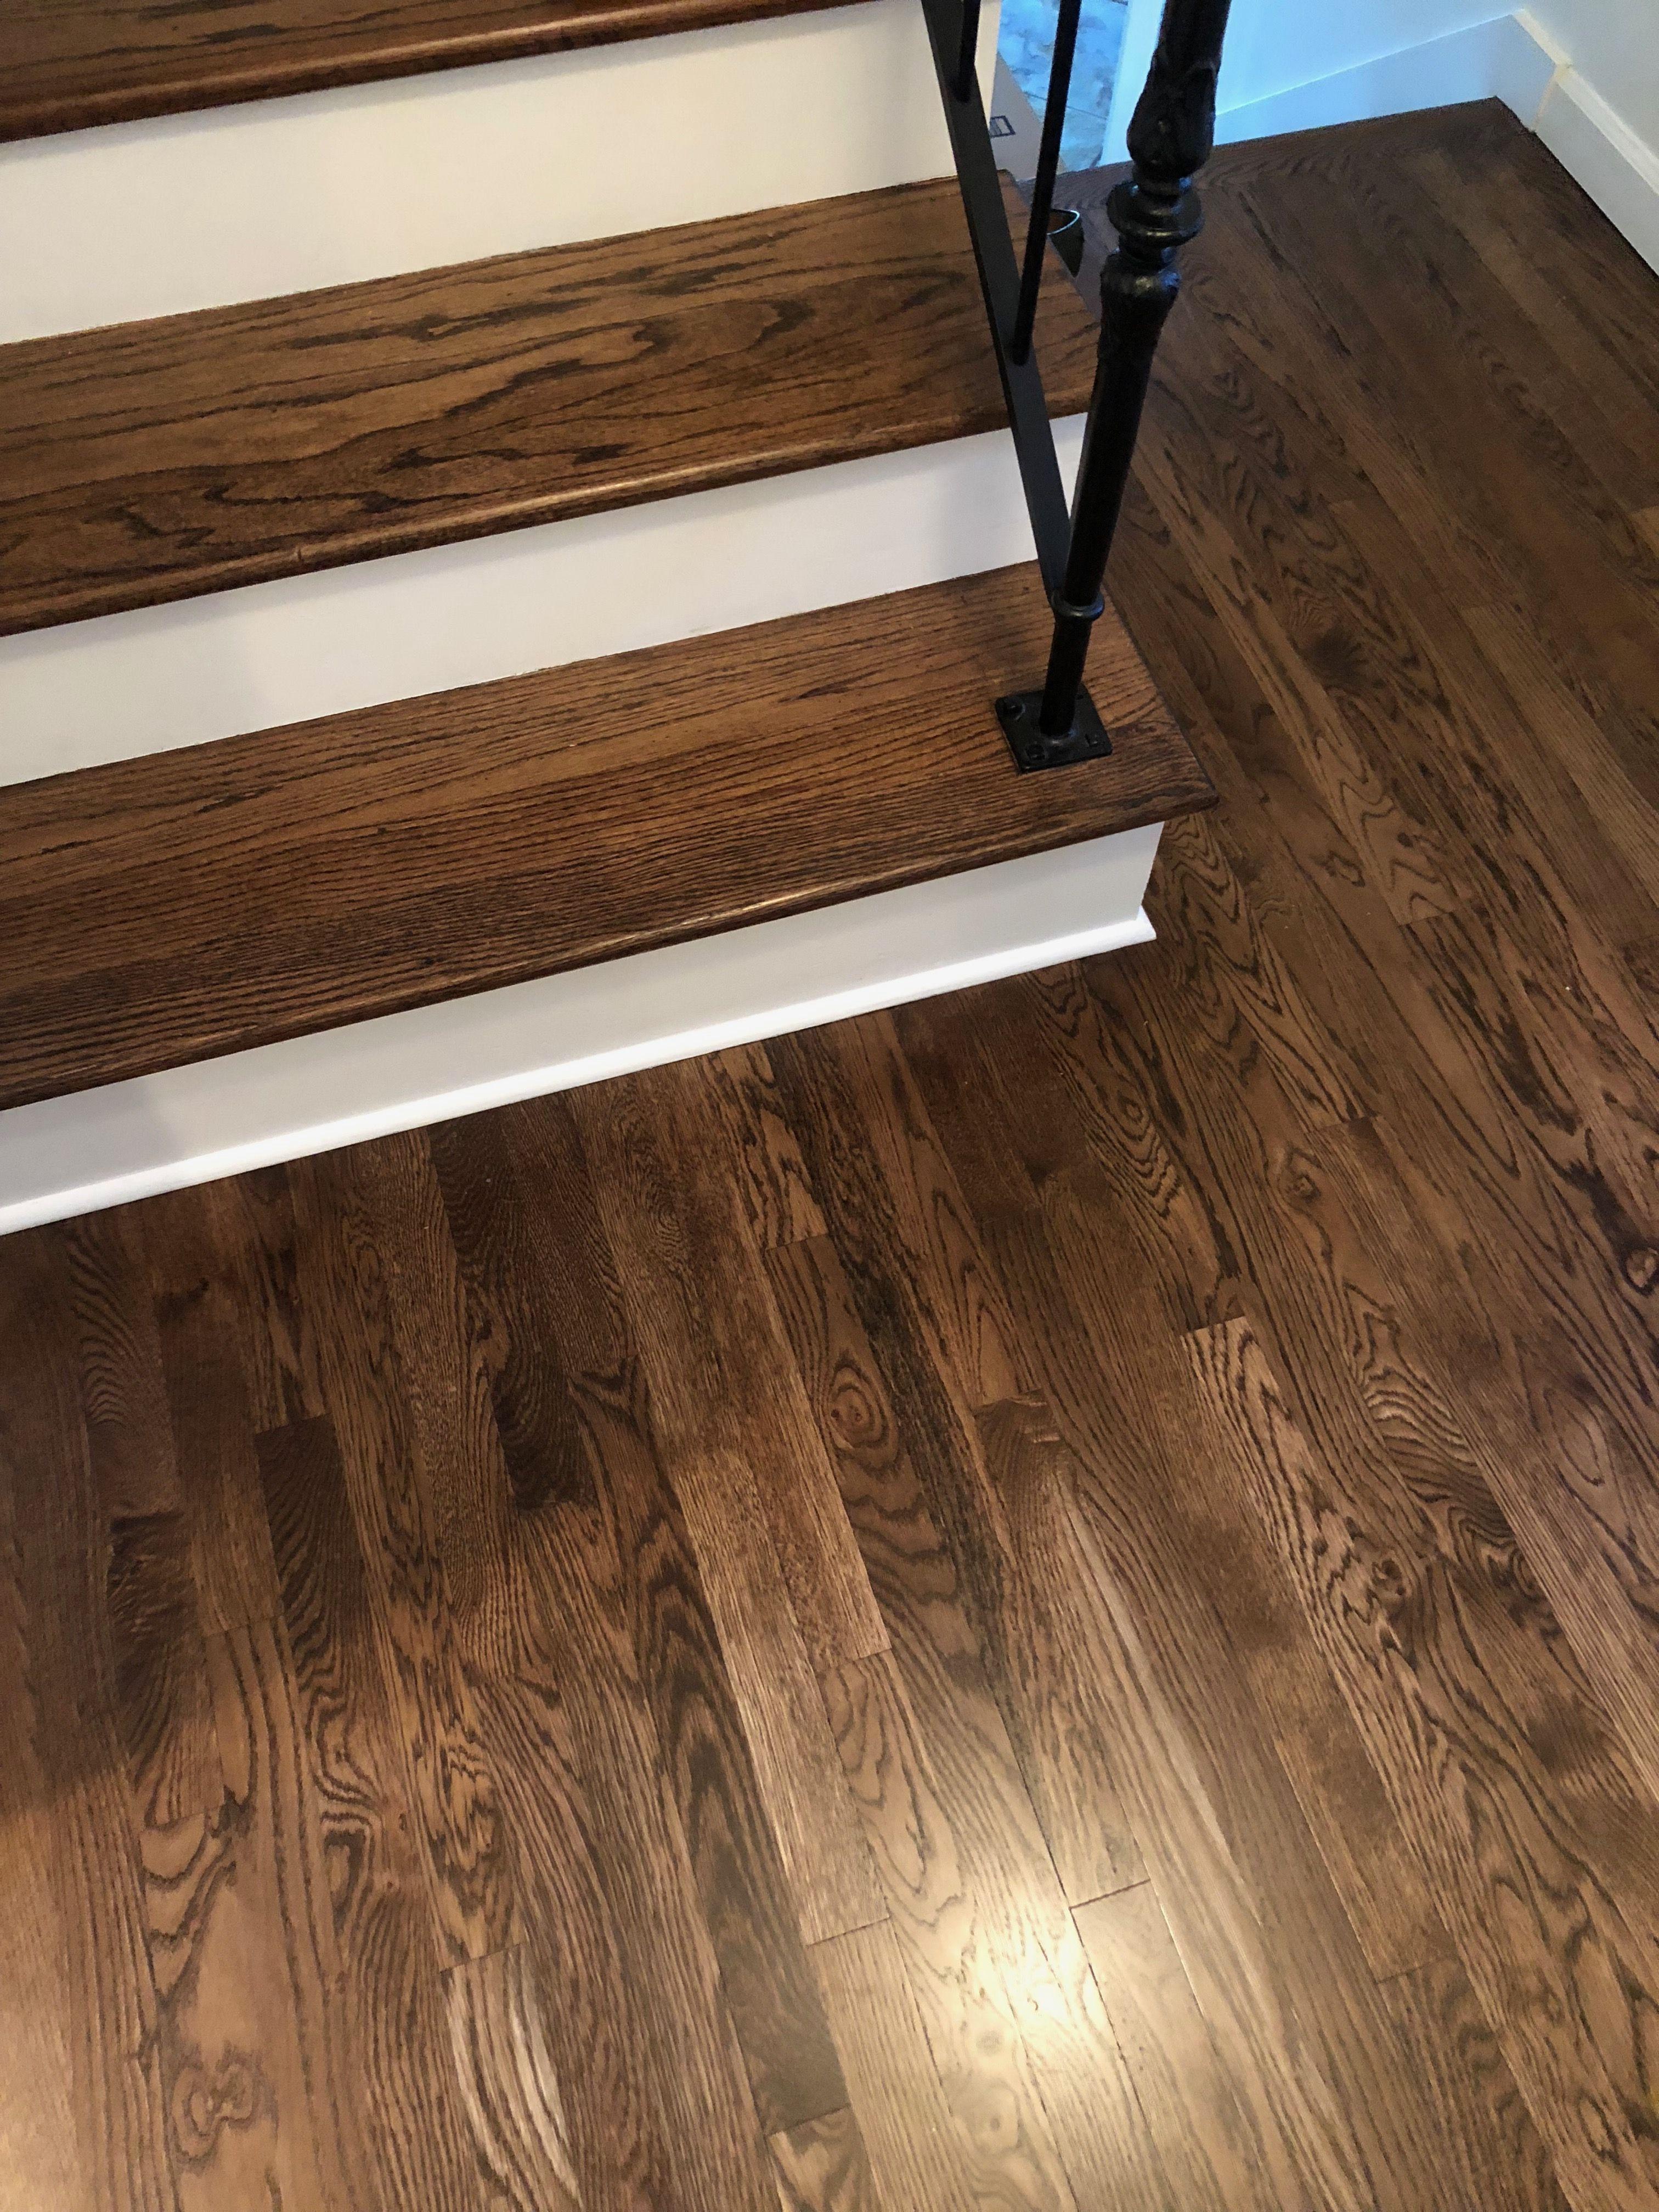 3 4 red oak hardwood flooring of duraseal dark walnut with satin finish floors are select white oak within duraseal dark walnut with satin finish floors are select white oak and stair tread is